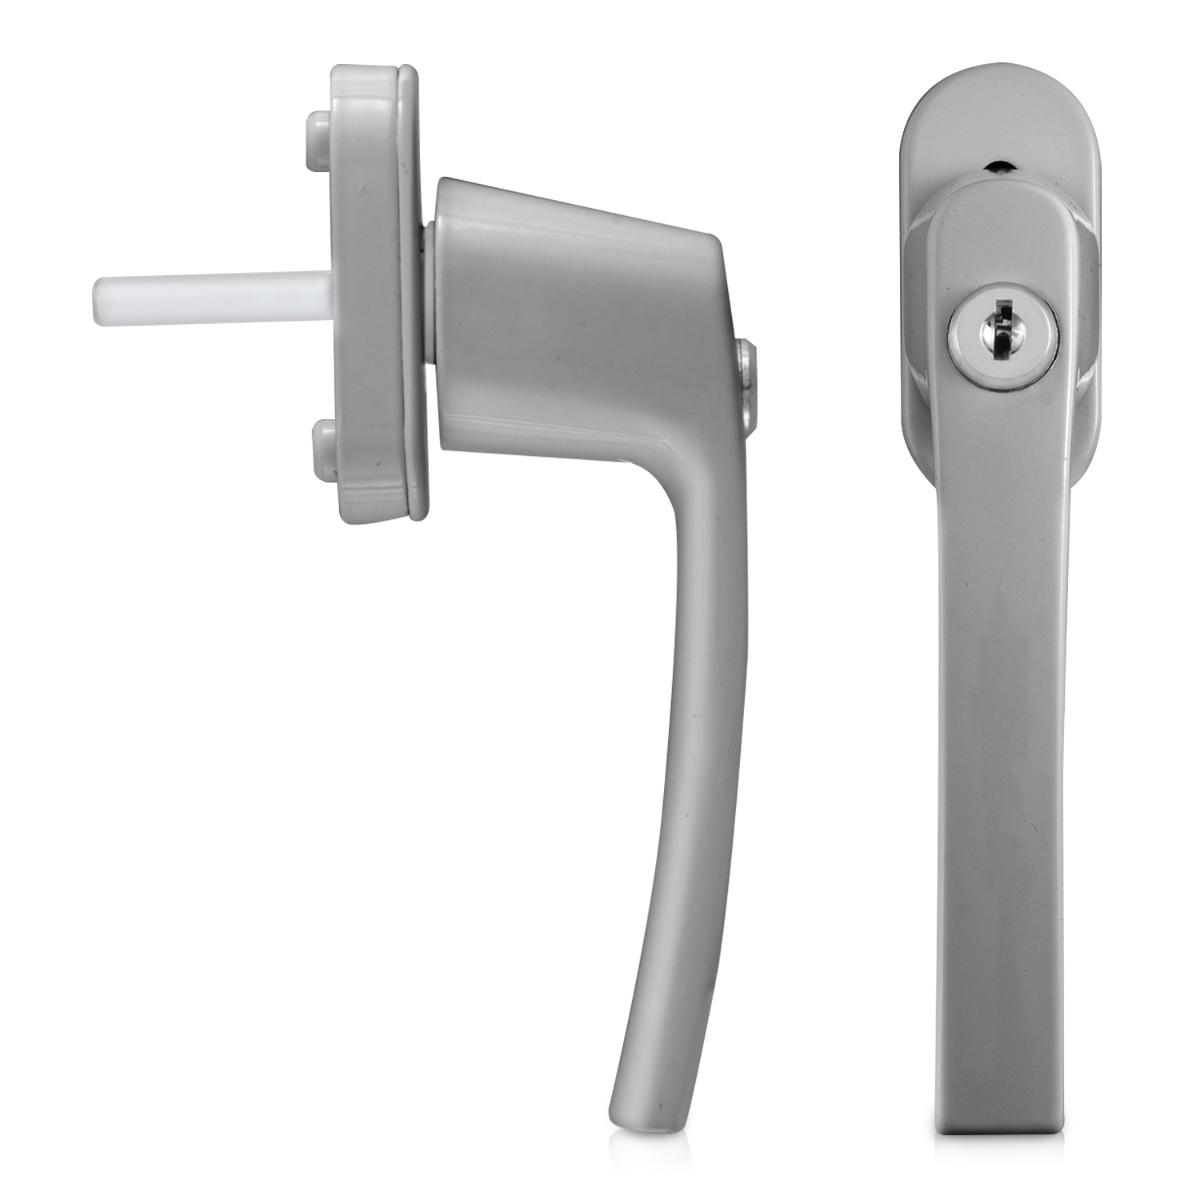 kwmobile 4x aluminium fenstergriff mit schloss silber abschlie bar ebay. Black Bedroom Furniture Sets. Home Design Ideas